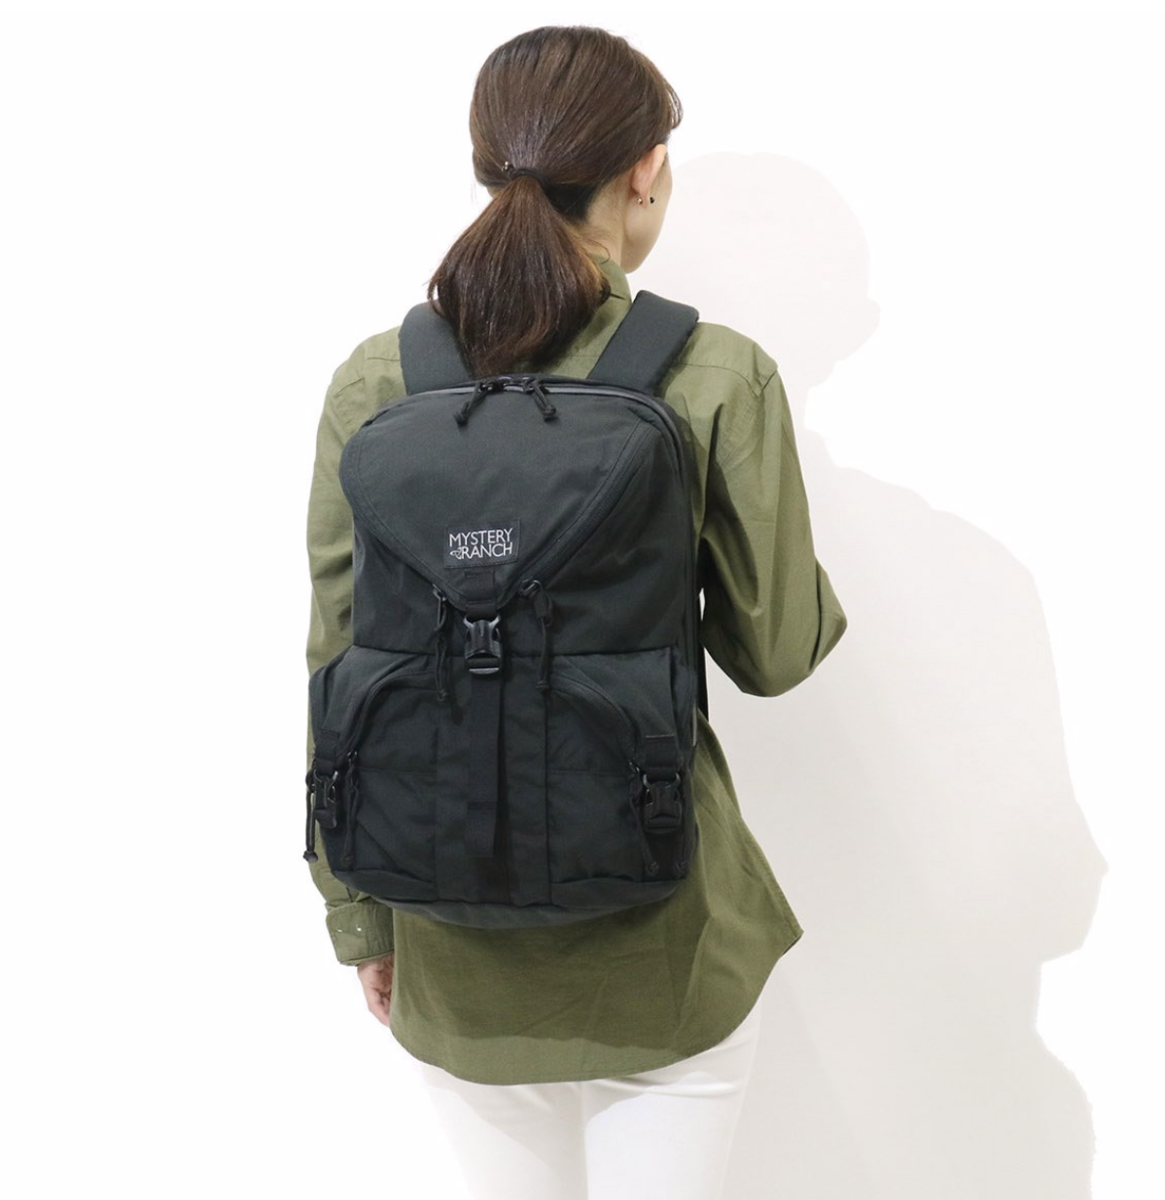 f:id:thebackpack:20190313223539p:plain